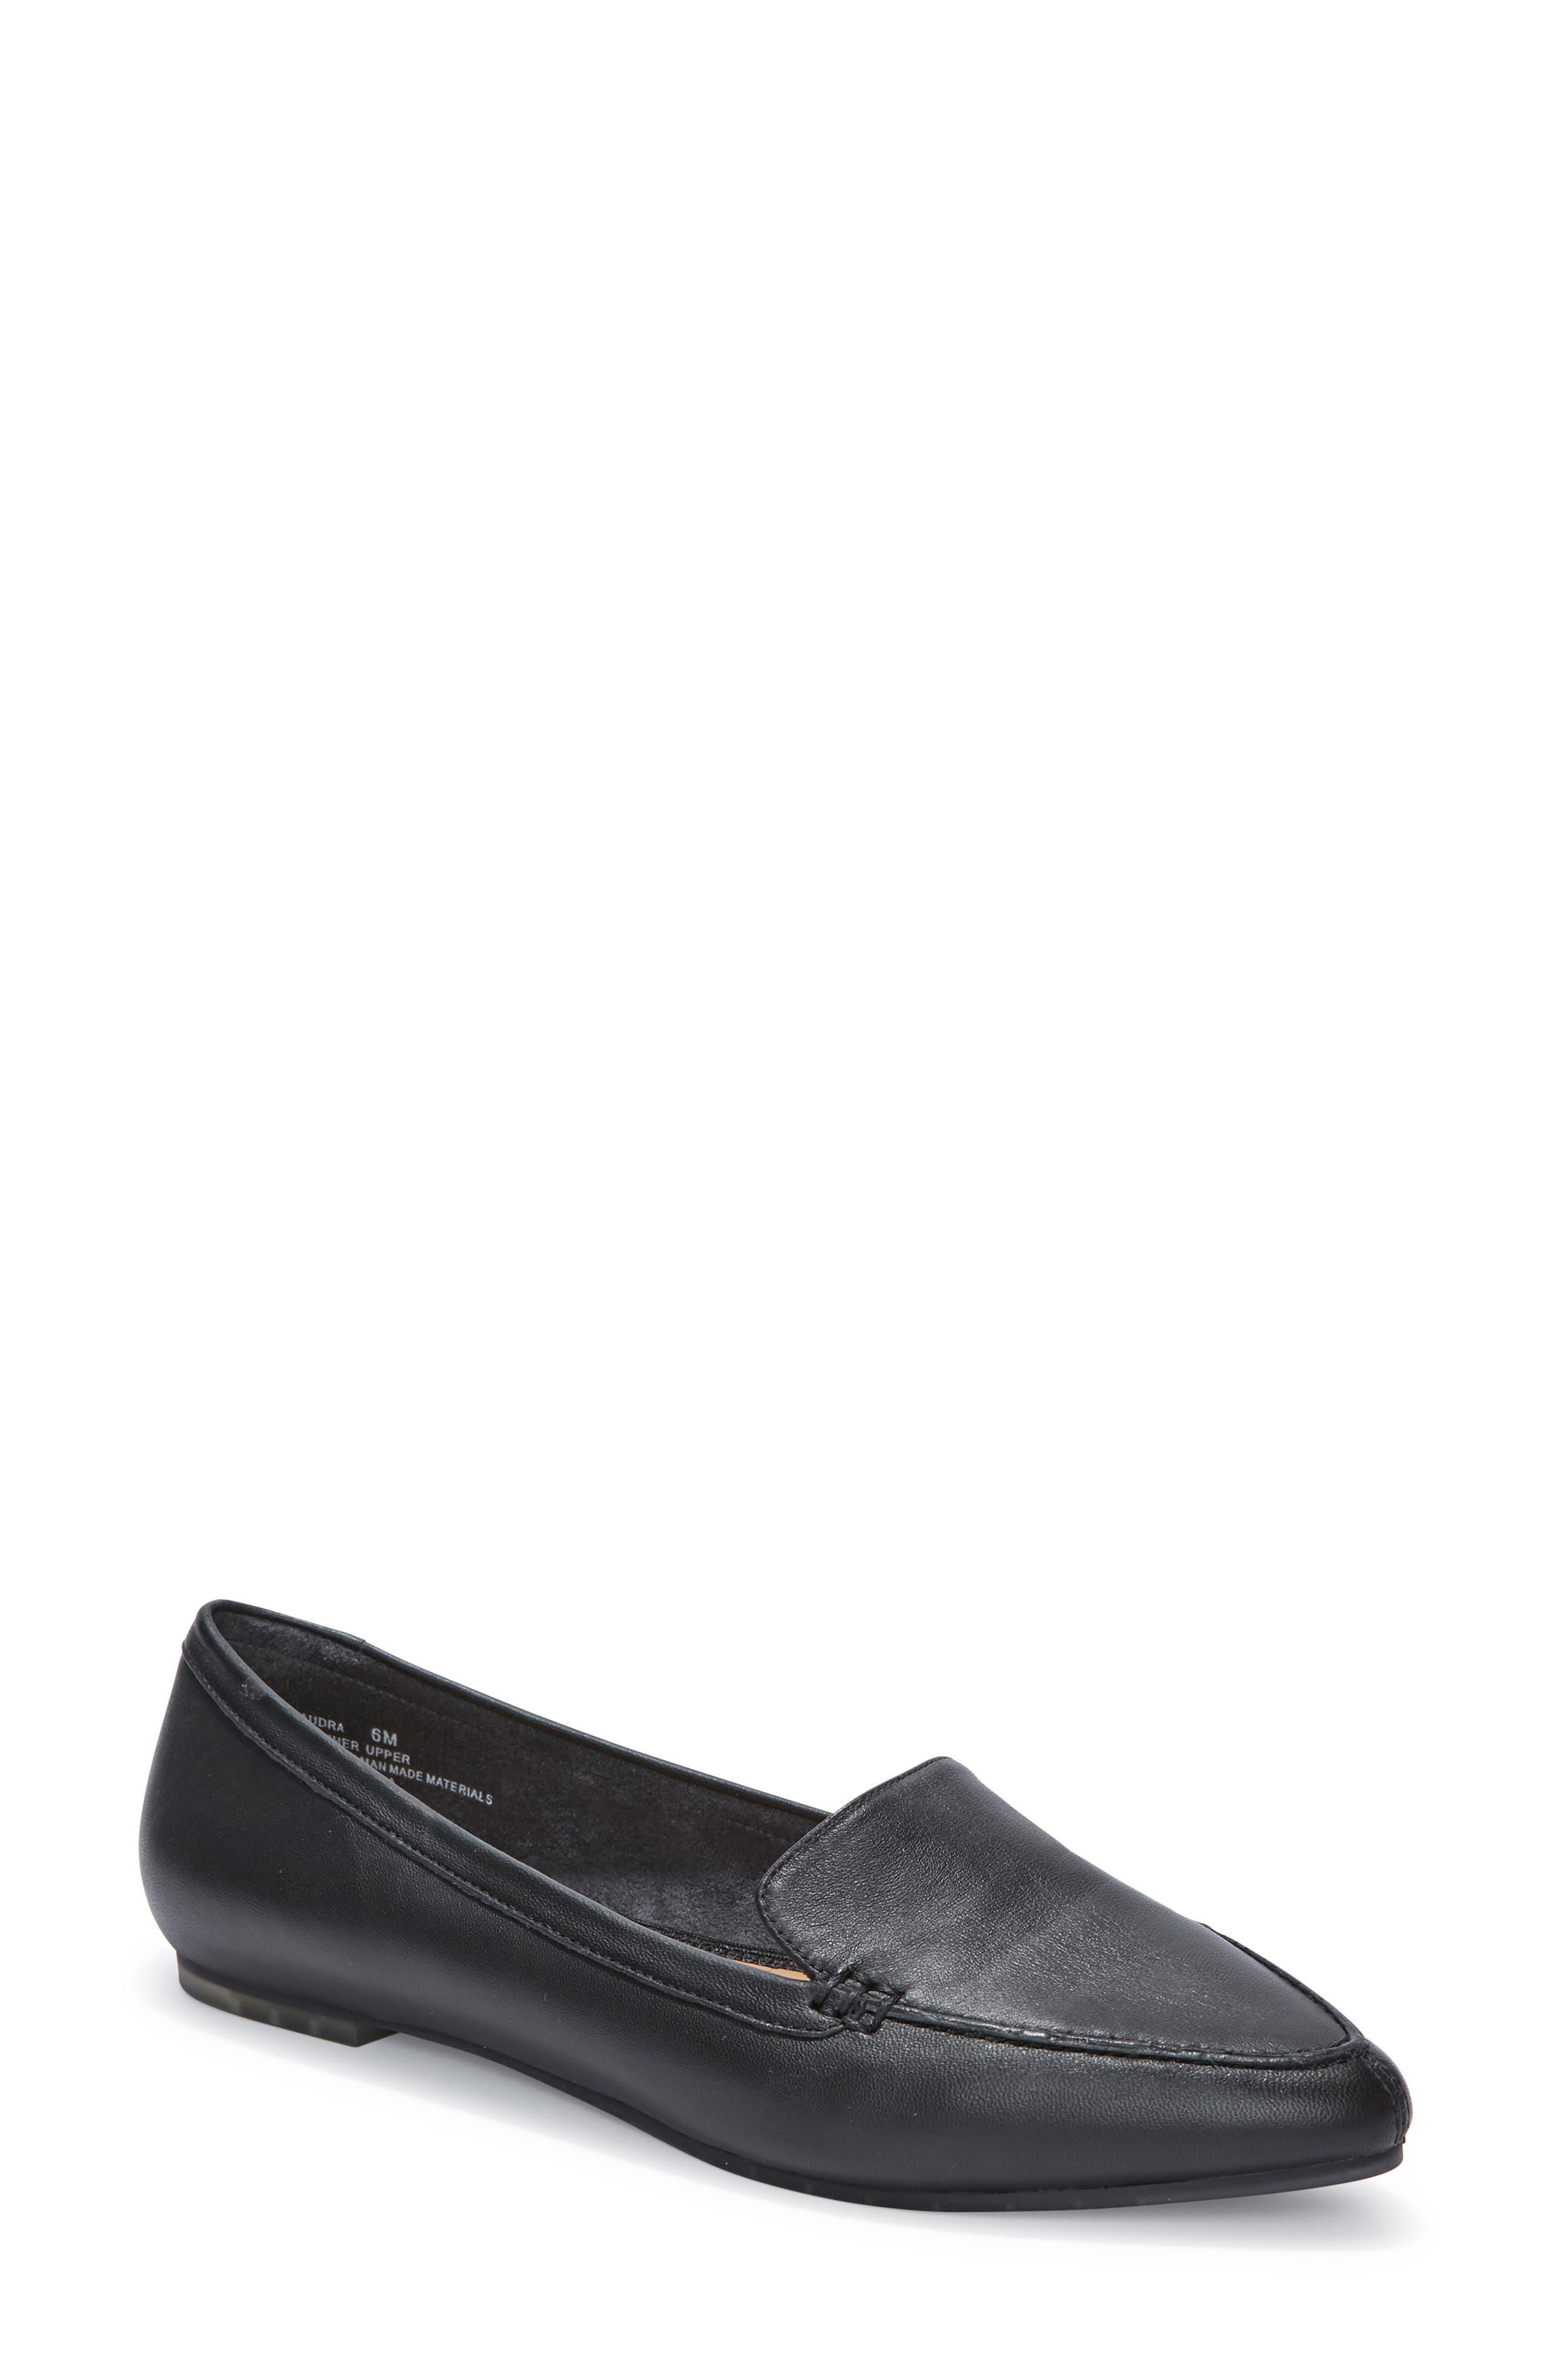 Me Too Audra Loafer Flat, Black